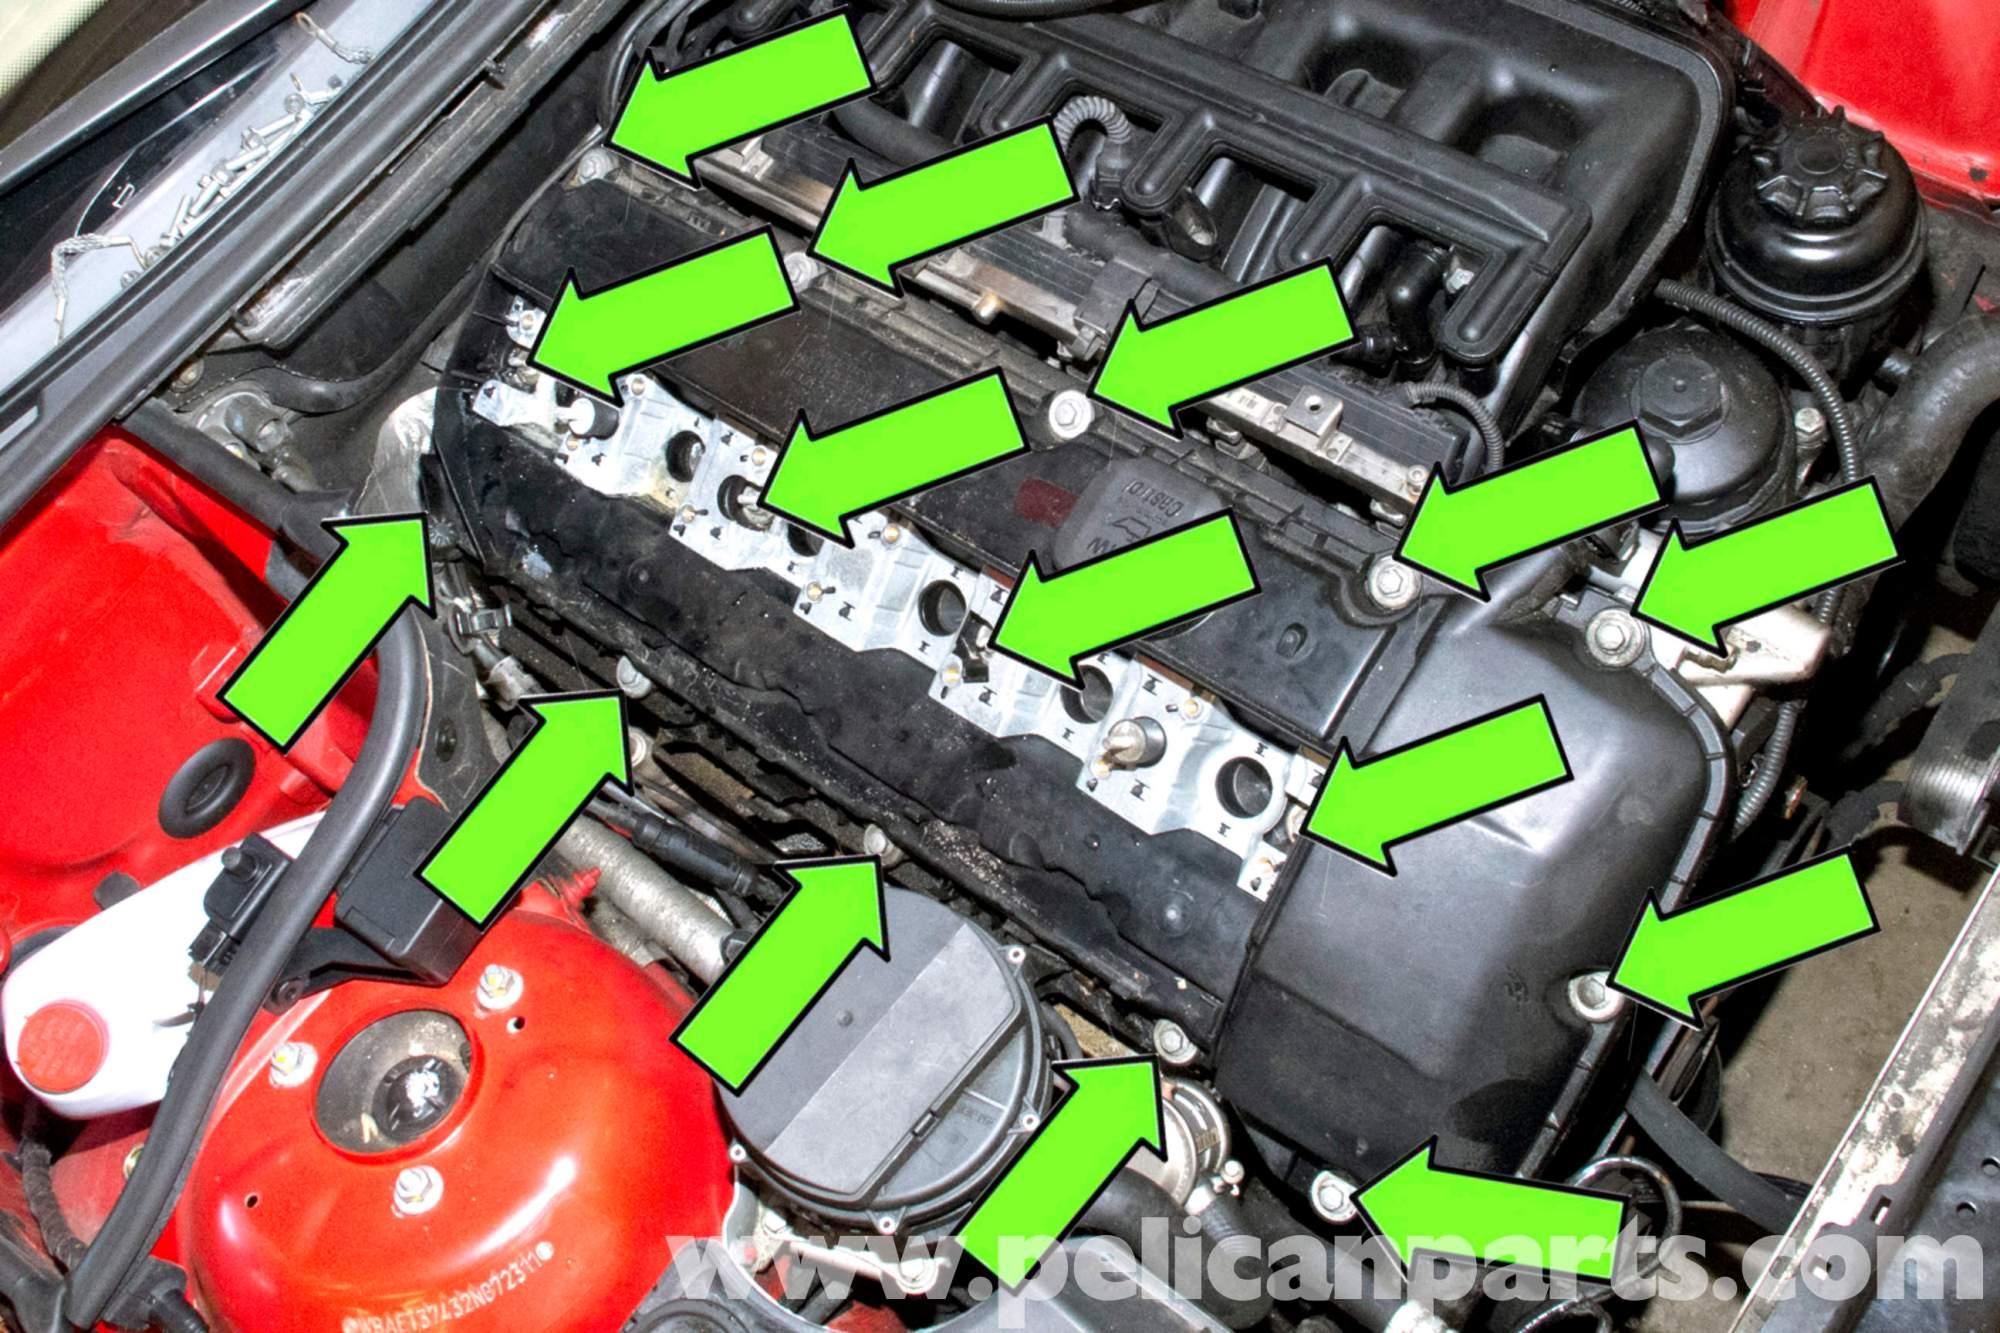 hight resolution of bmw e46 valve cover removal bmw 325i 2001 2005 bmw 325xi 2001 bmw e48 bmw e46 wire fasteners